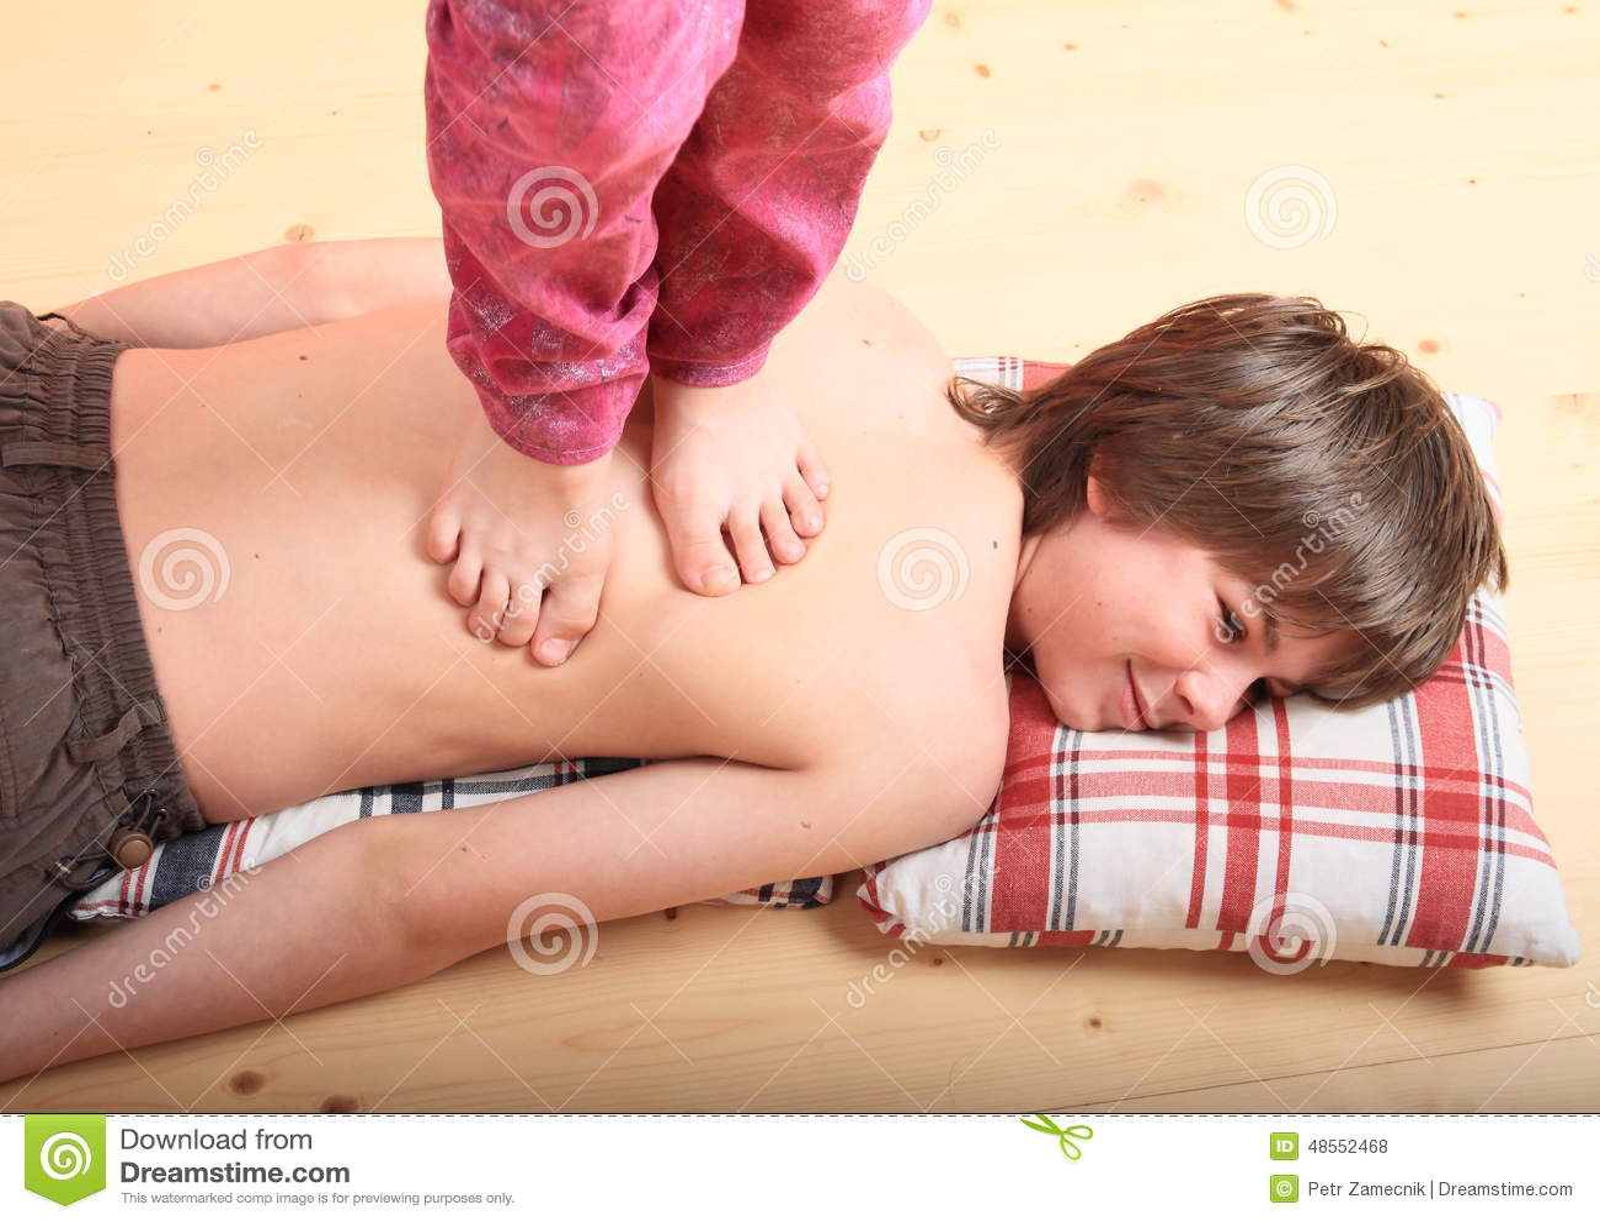 naked women lying on a boy